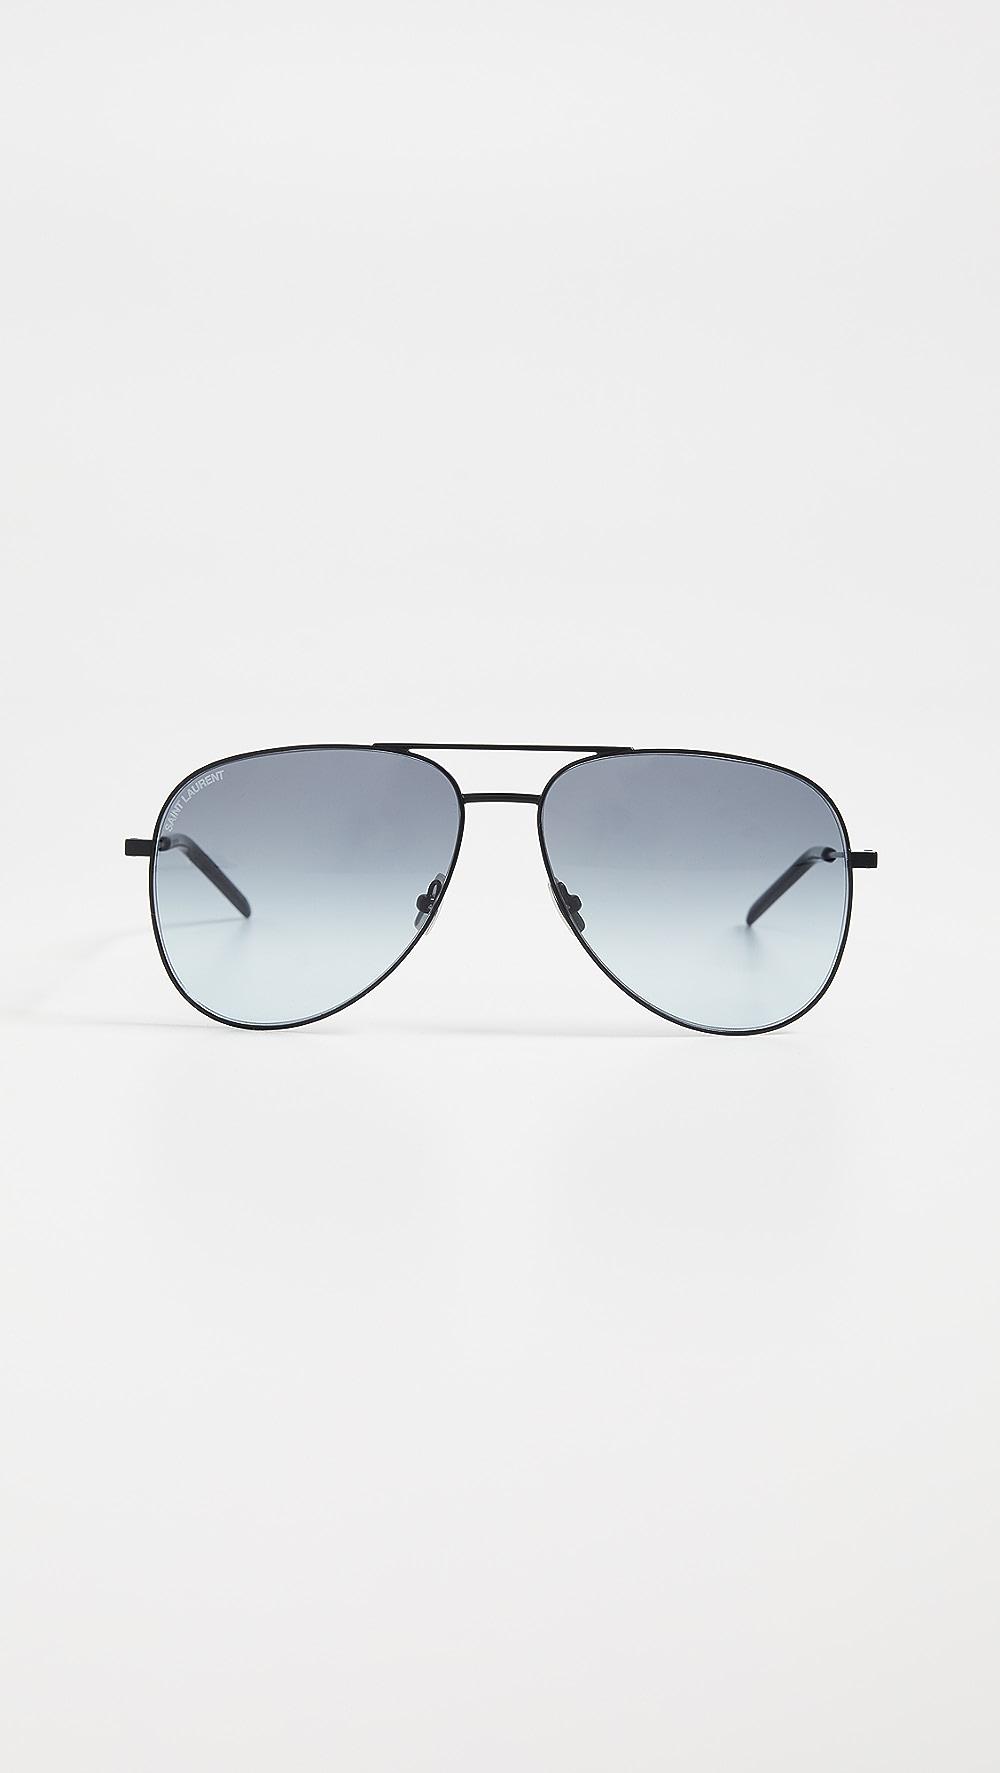 Saint Laurent Eyewear